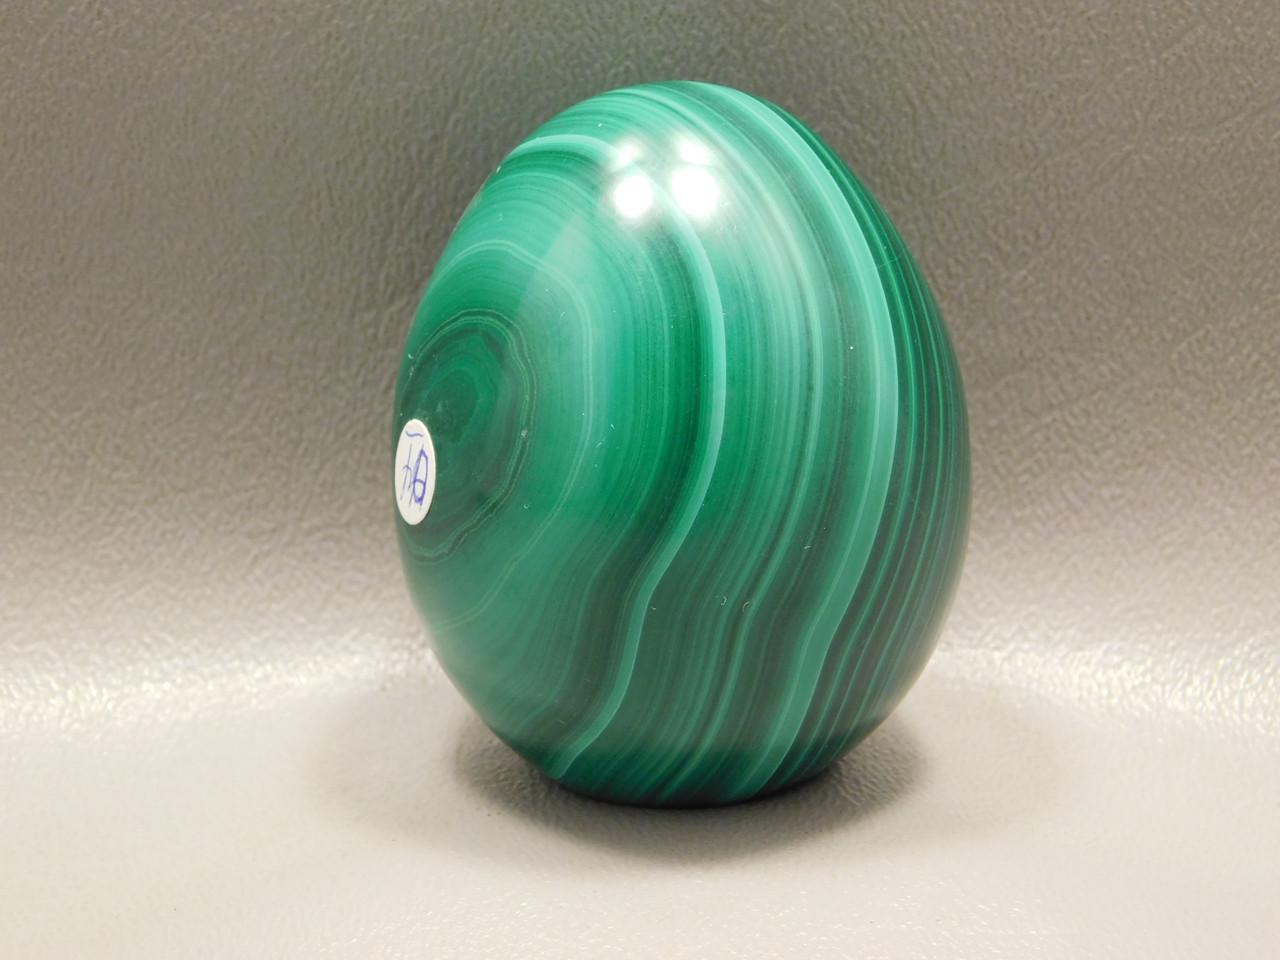 Stone Egg Malachite 2.25 inch Gemstone African Green Rock #O4